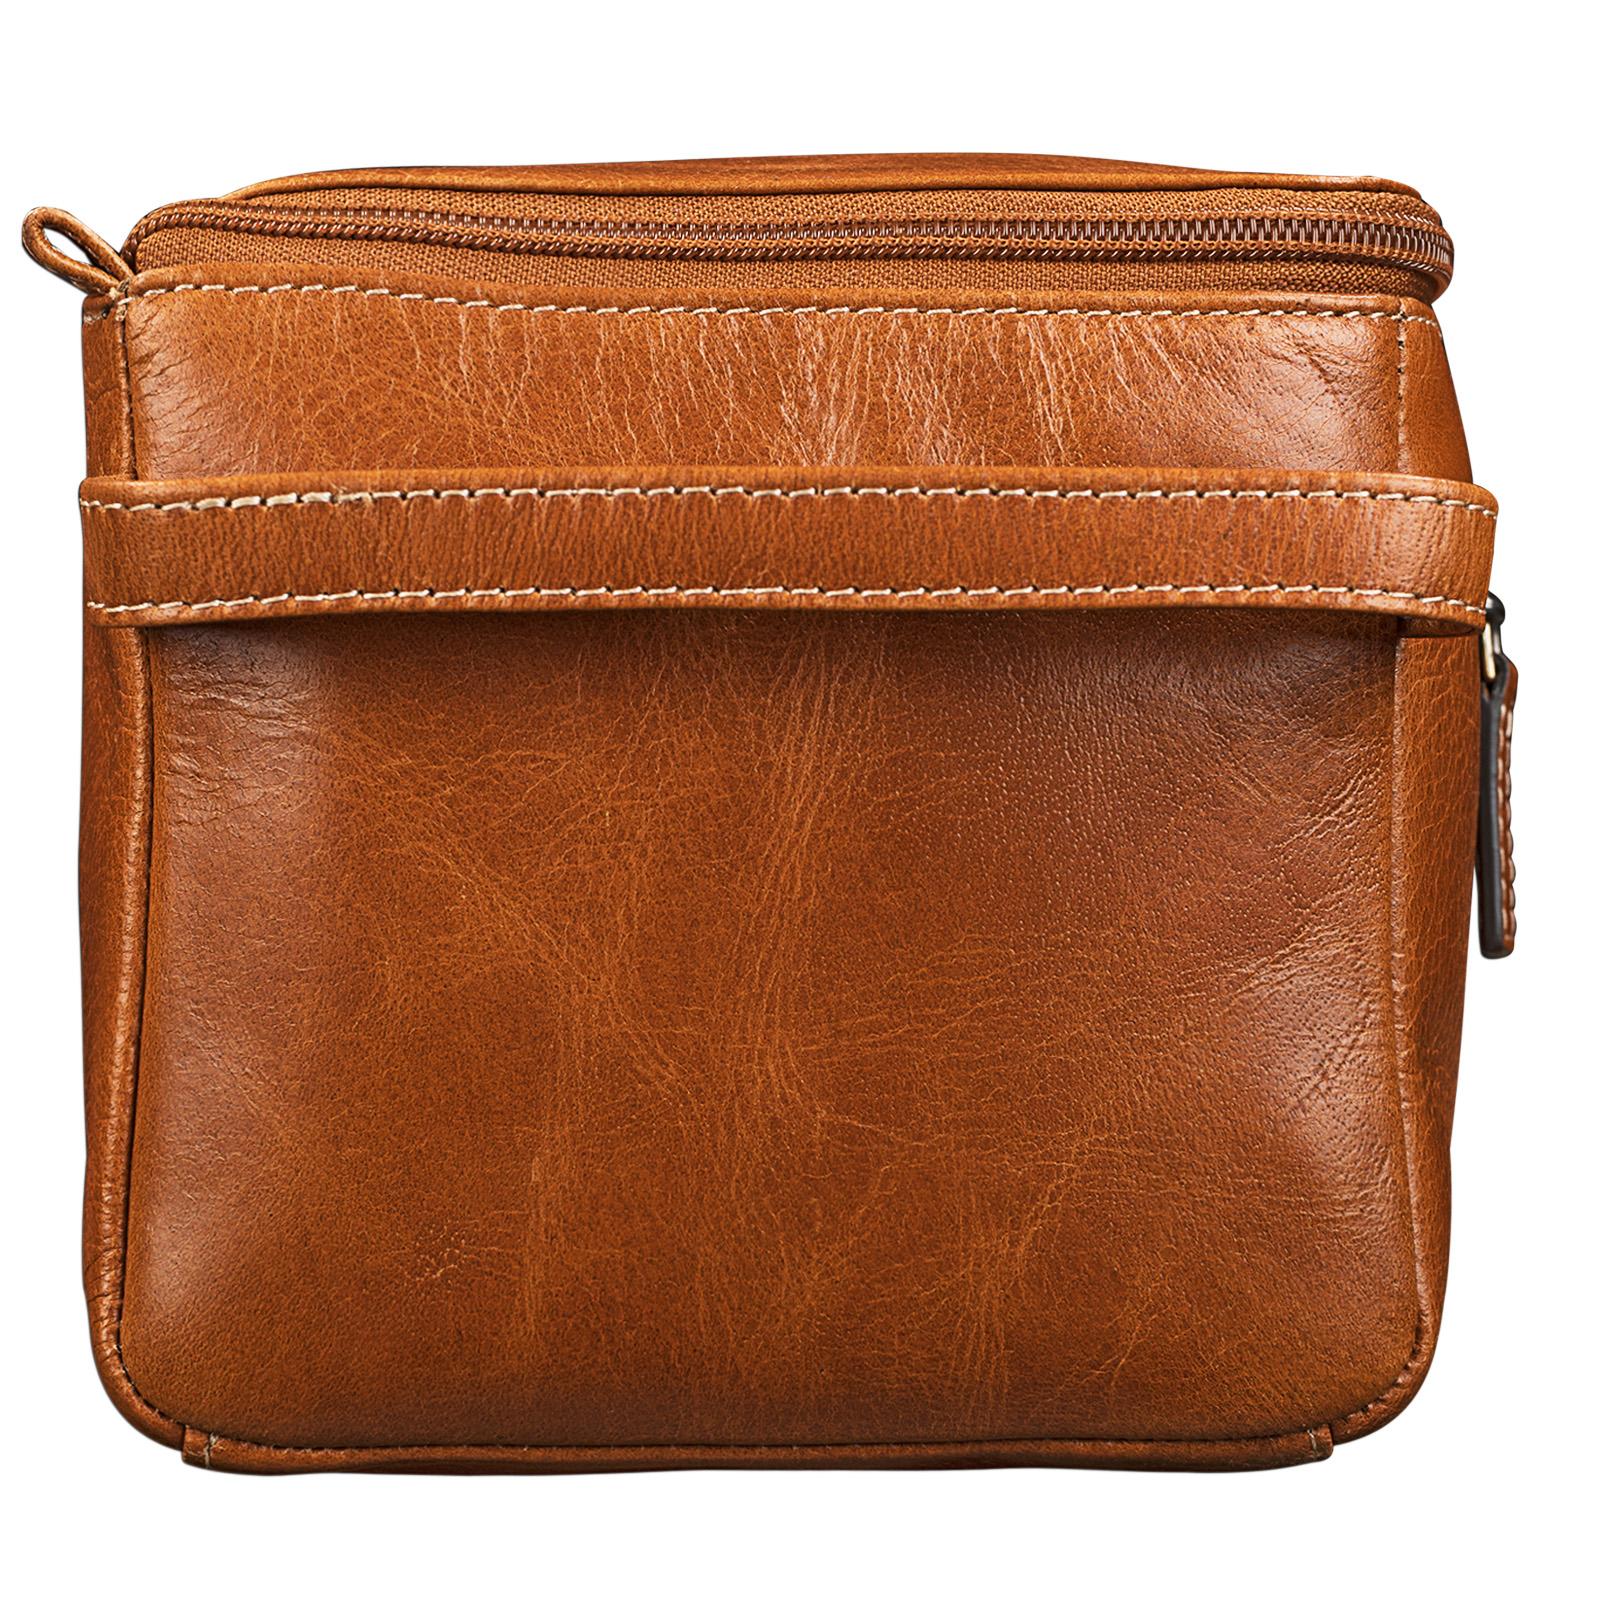 Reiseaccessoire Damen Leder Kulturtasche